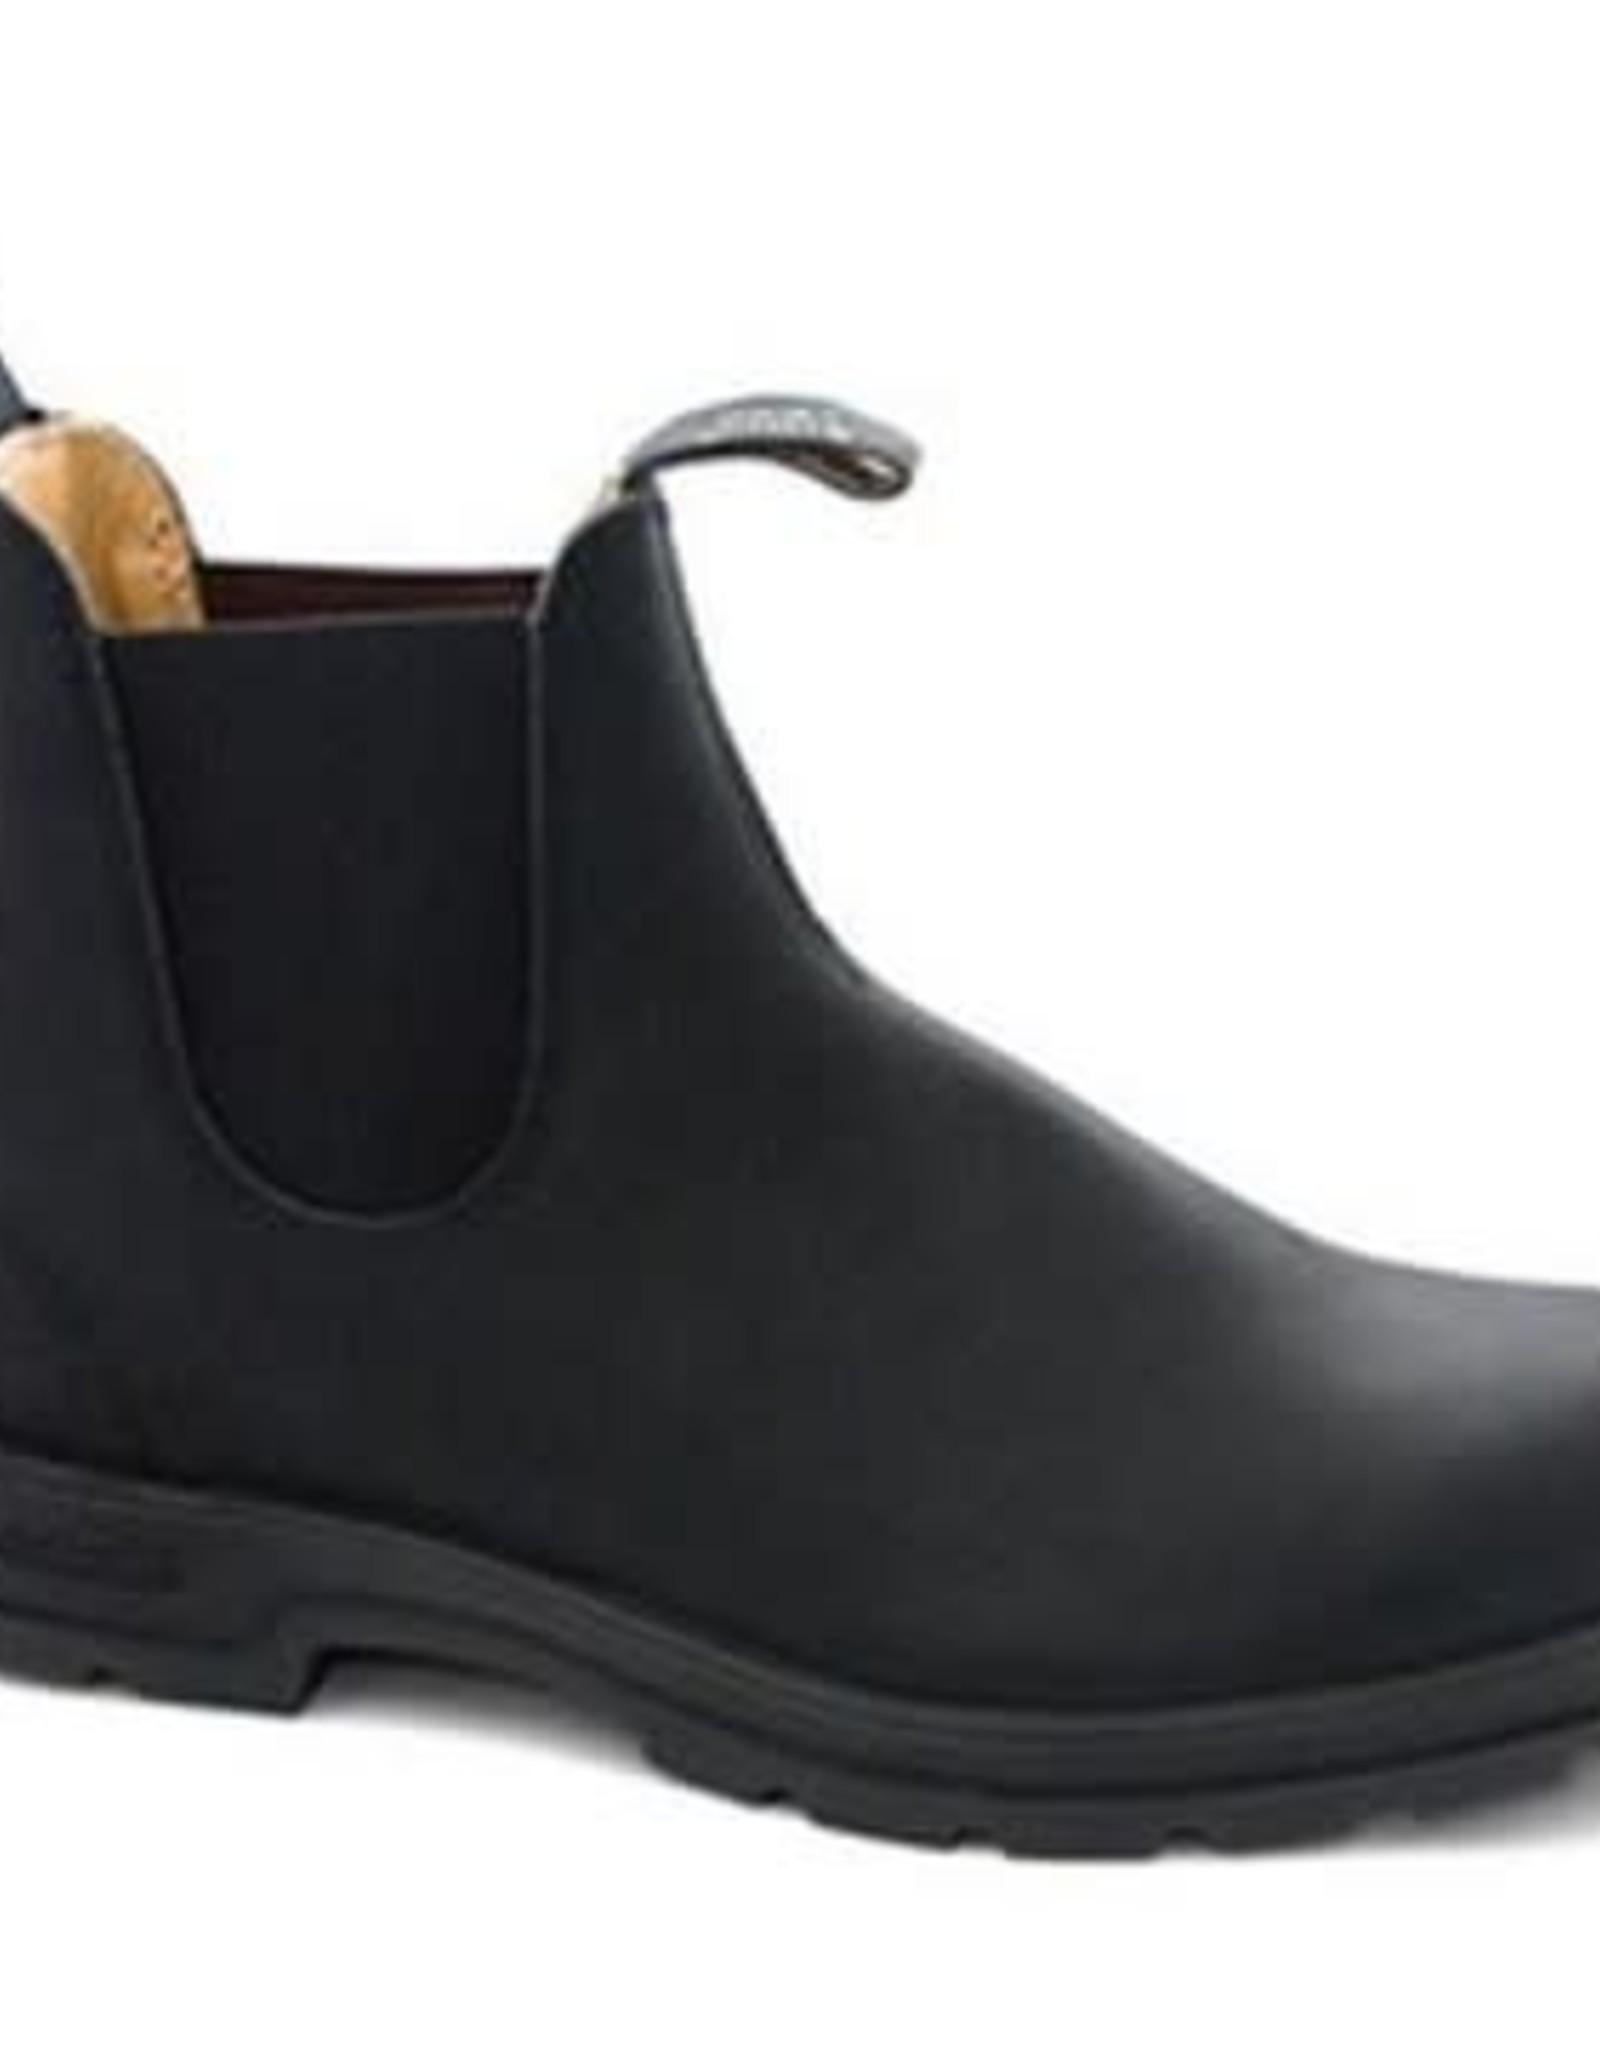 Blundstone Blundstone, 558 Leather Lined Black , 1WIDTH, 11